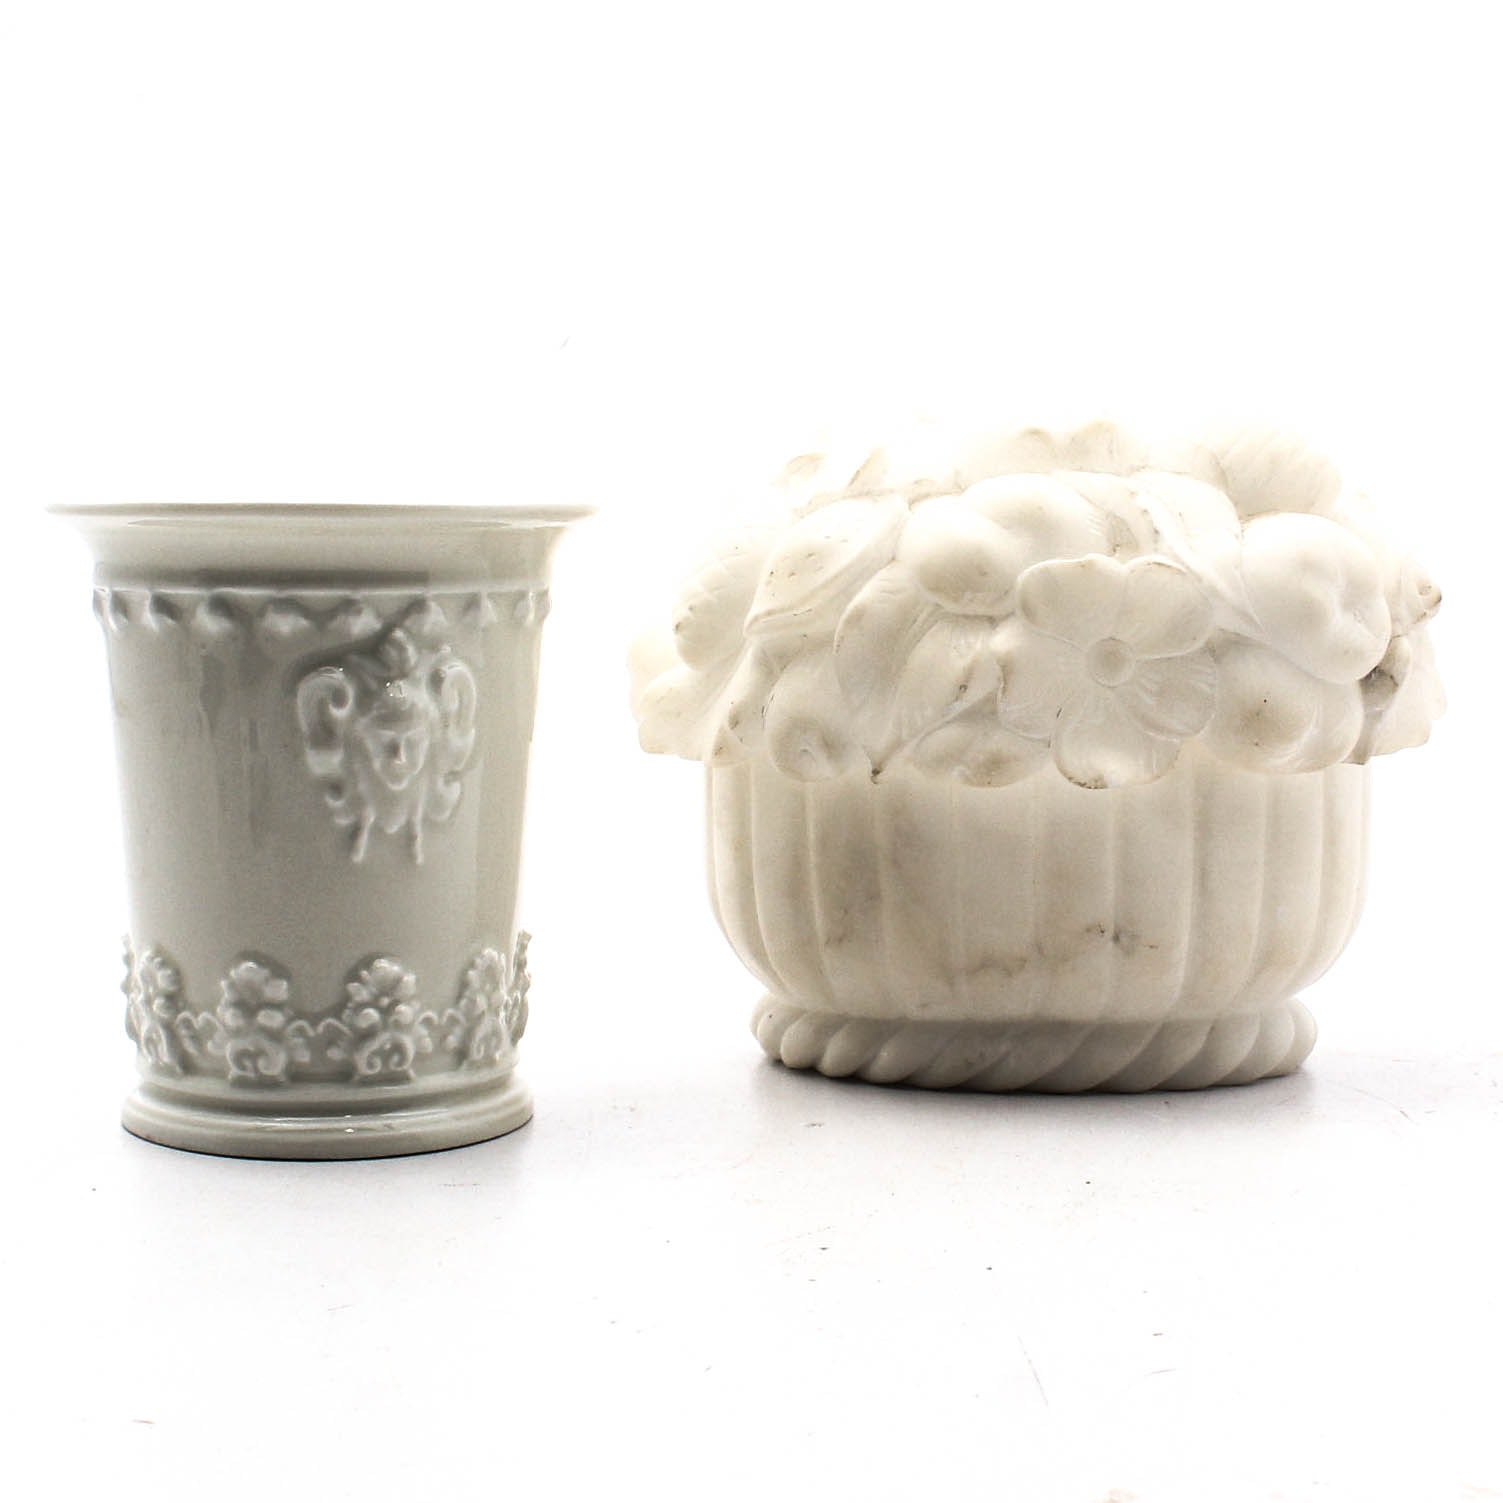 Alabaster Lidded Bowl and Limoges Reproduction Meissen Inspired Beaker